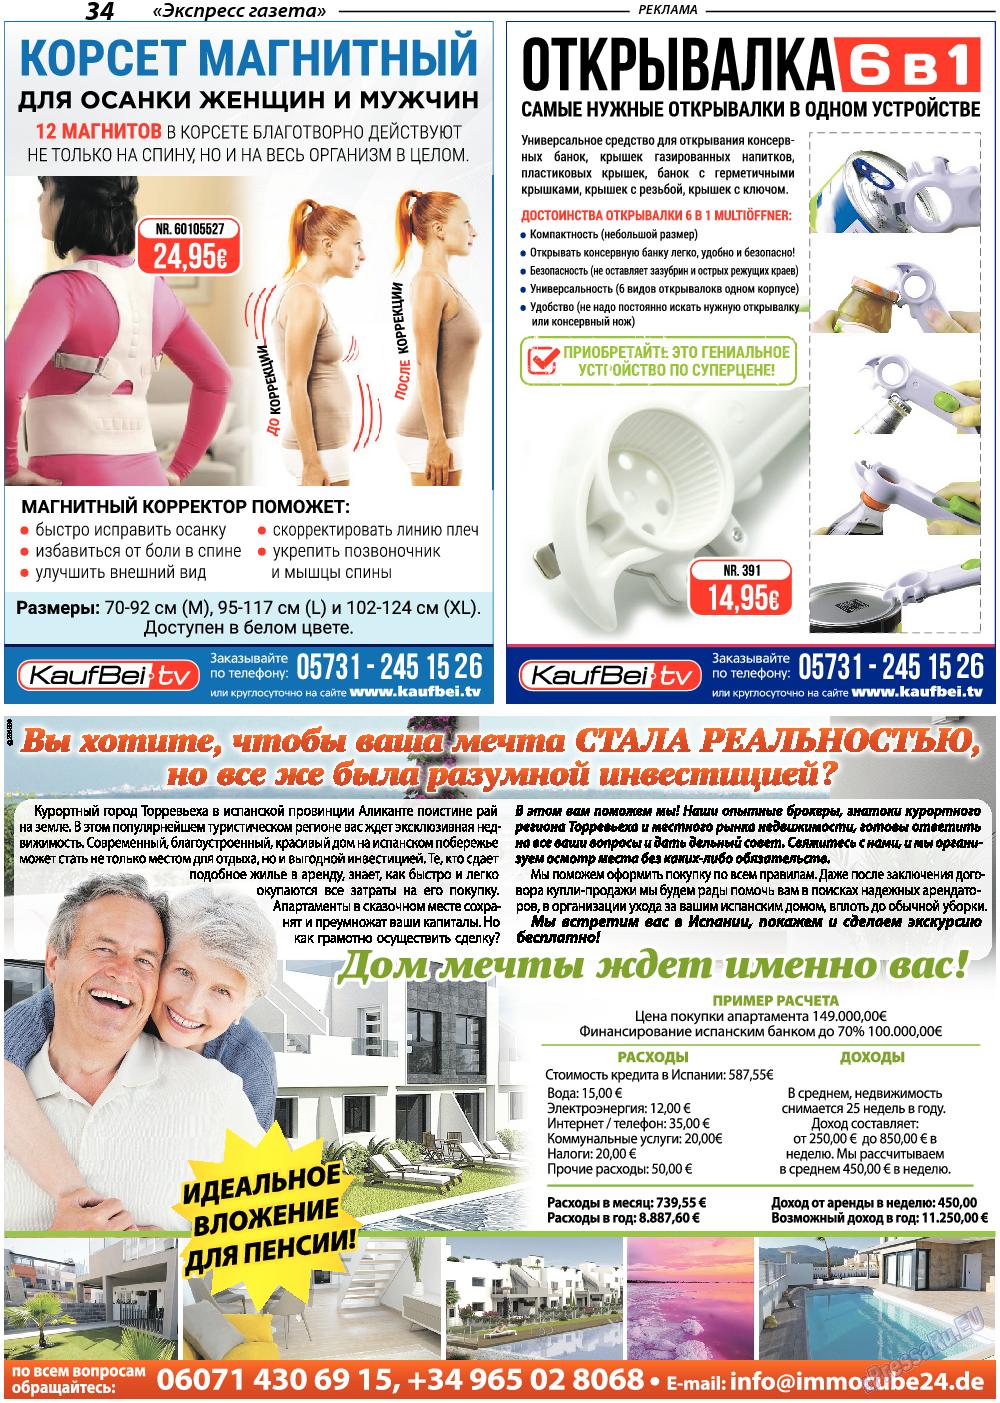 Экспресс газета (газета). 2018 год, номер 2, стр. 34